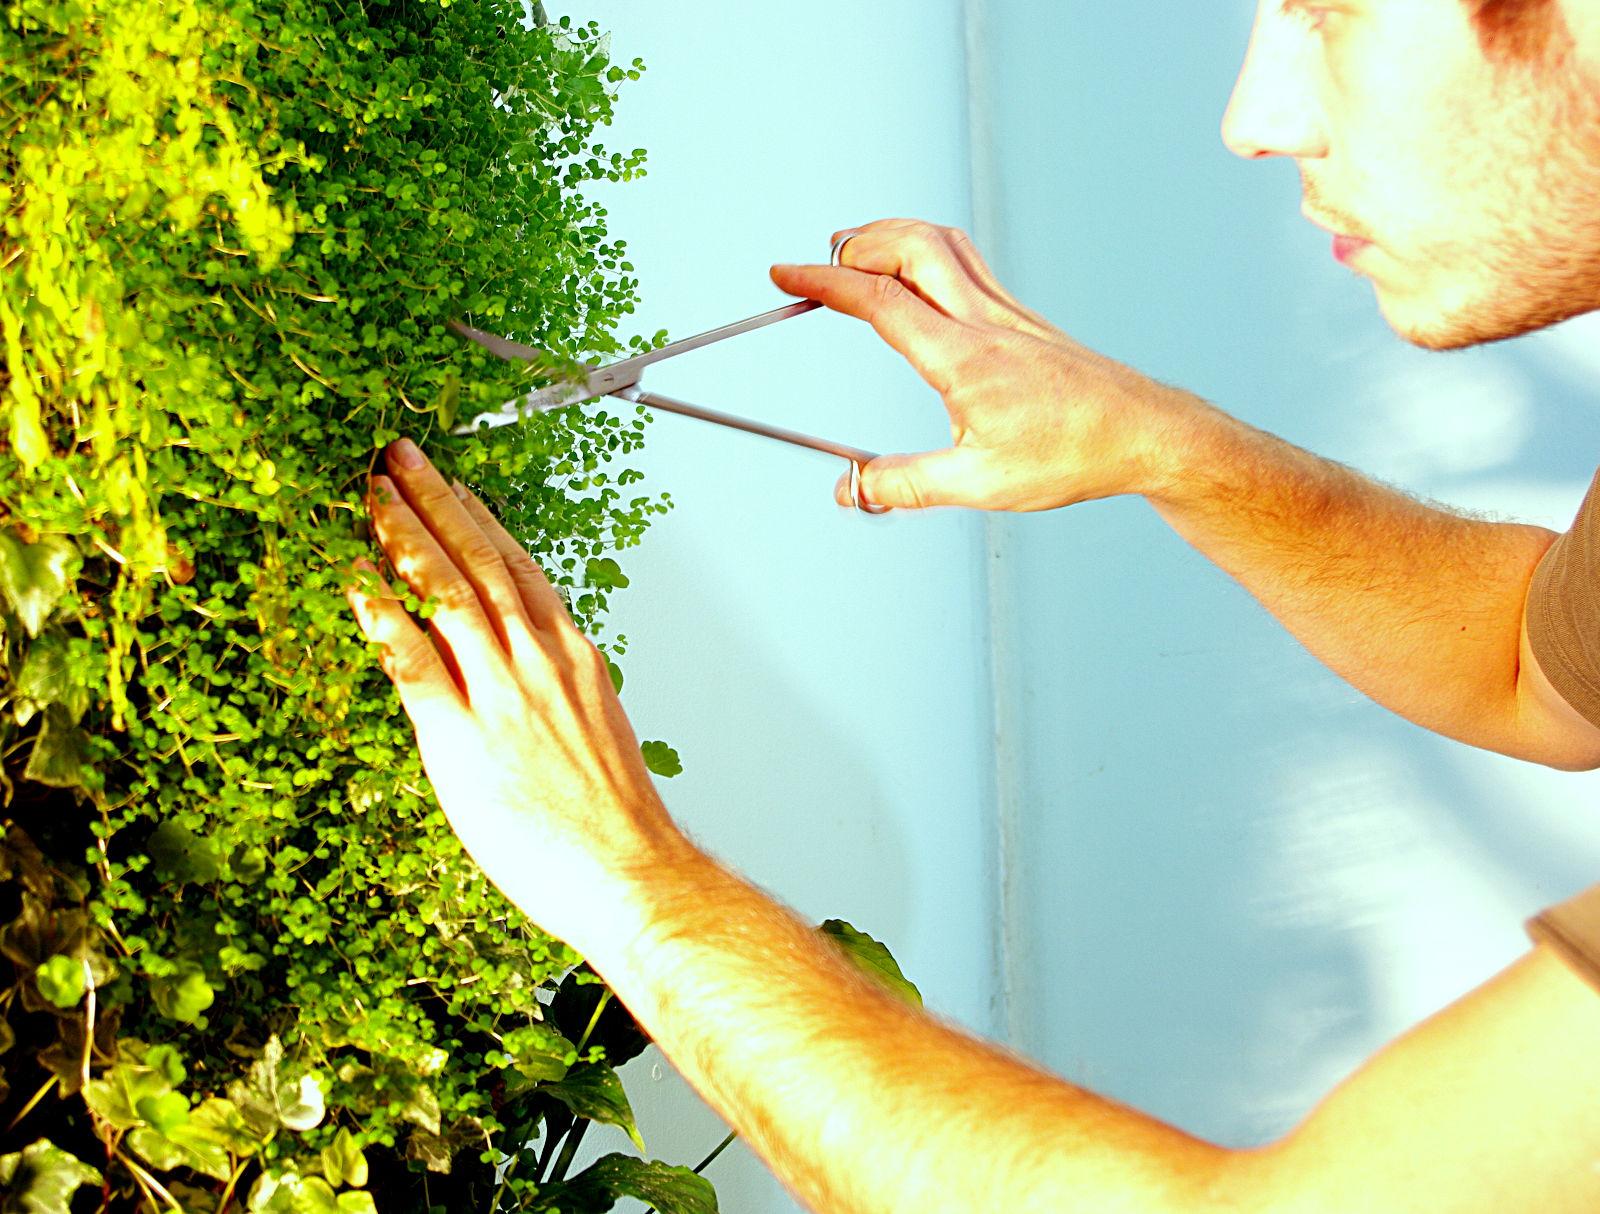 entretien d un jardin vertical mur v 233 g 233 tal et aquarium